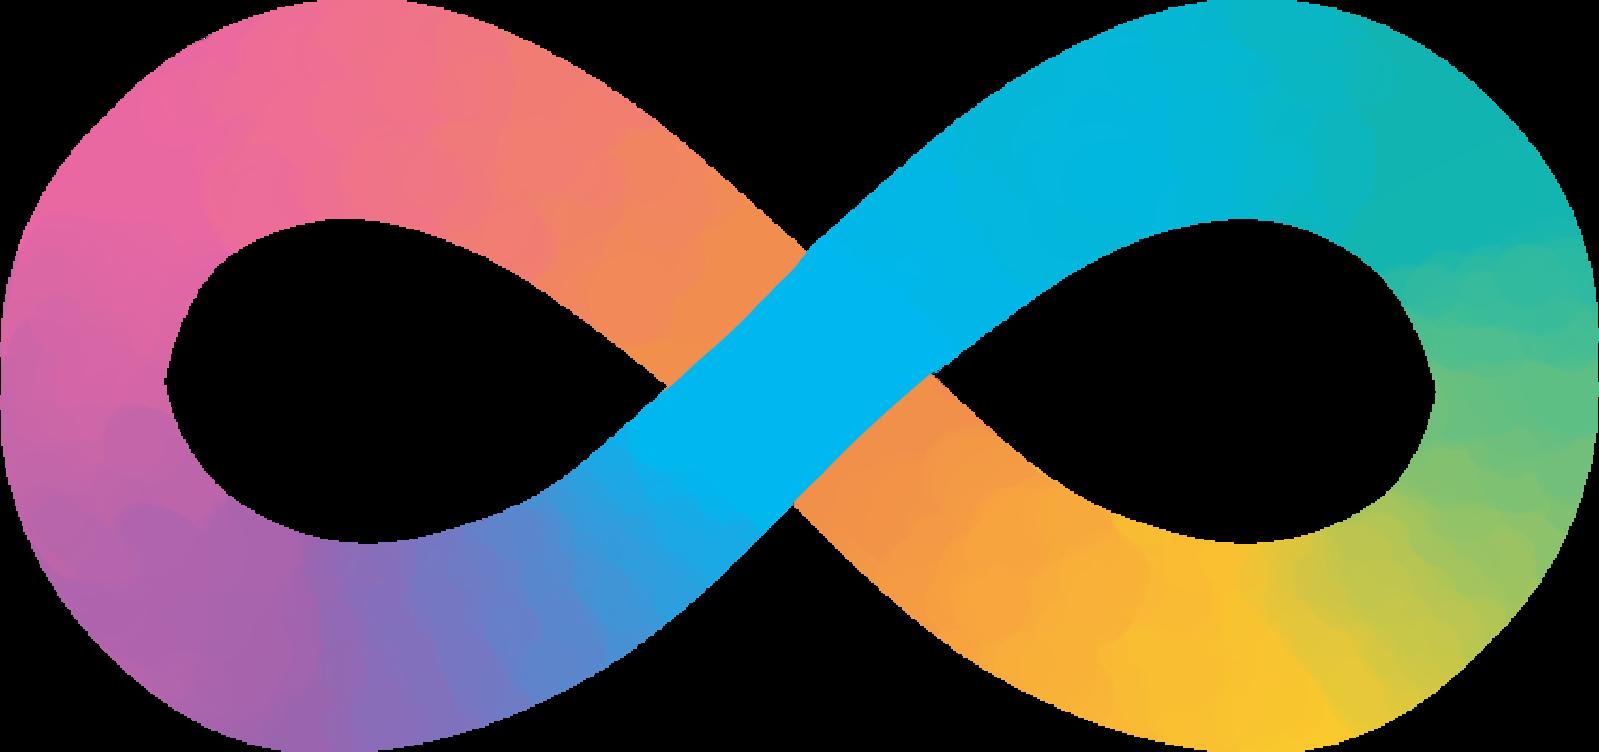 All credits to MissLunaRose 12: https://commons.wikimedia.org/wiki/File:Pastel_Neurodiversity_Symbol.png#filelinks